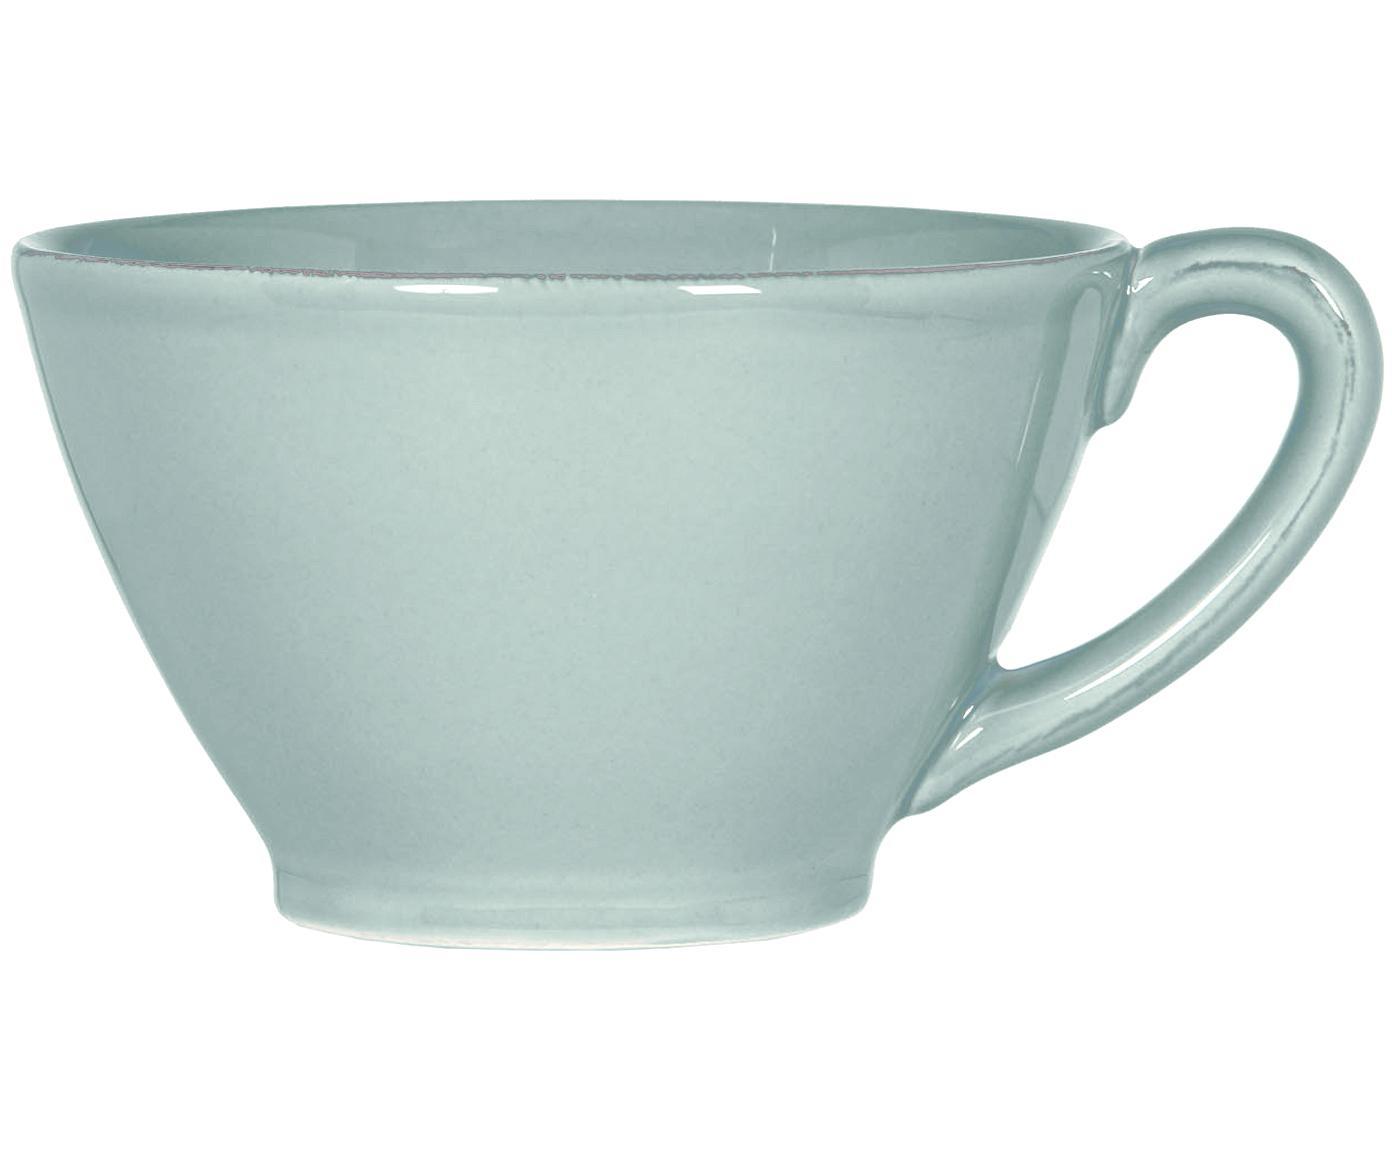 Tazza da te in menta Constance, Gres, Verde menta, Ø 18 x Alt. 9 cm